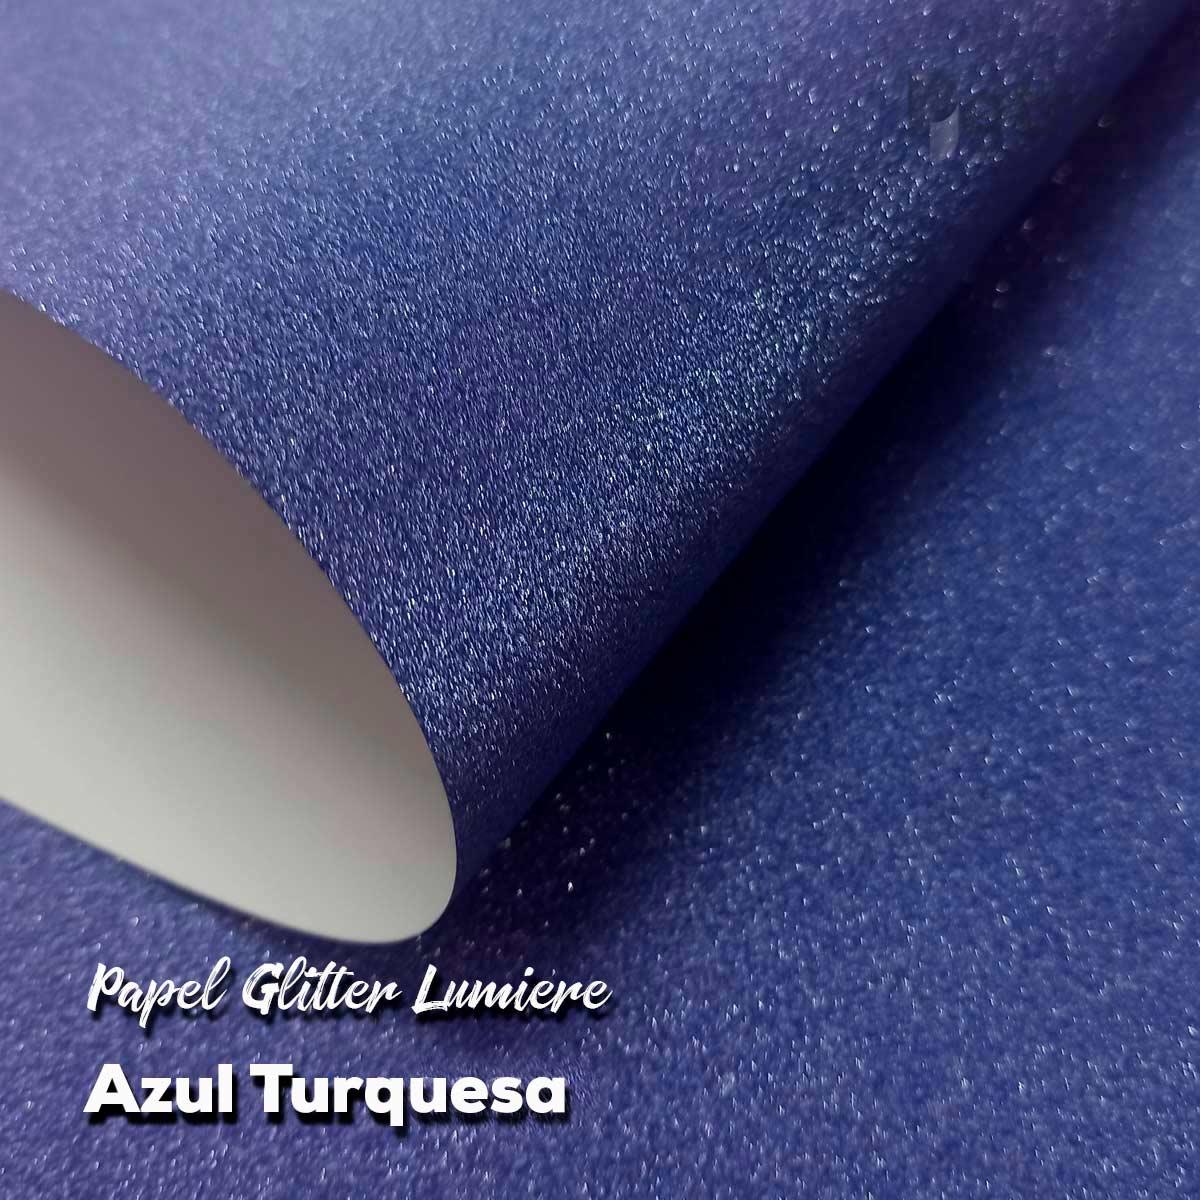 Papel Glitter Azul Turquesa 150g - 30,5x30,5cm com 6 folhas